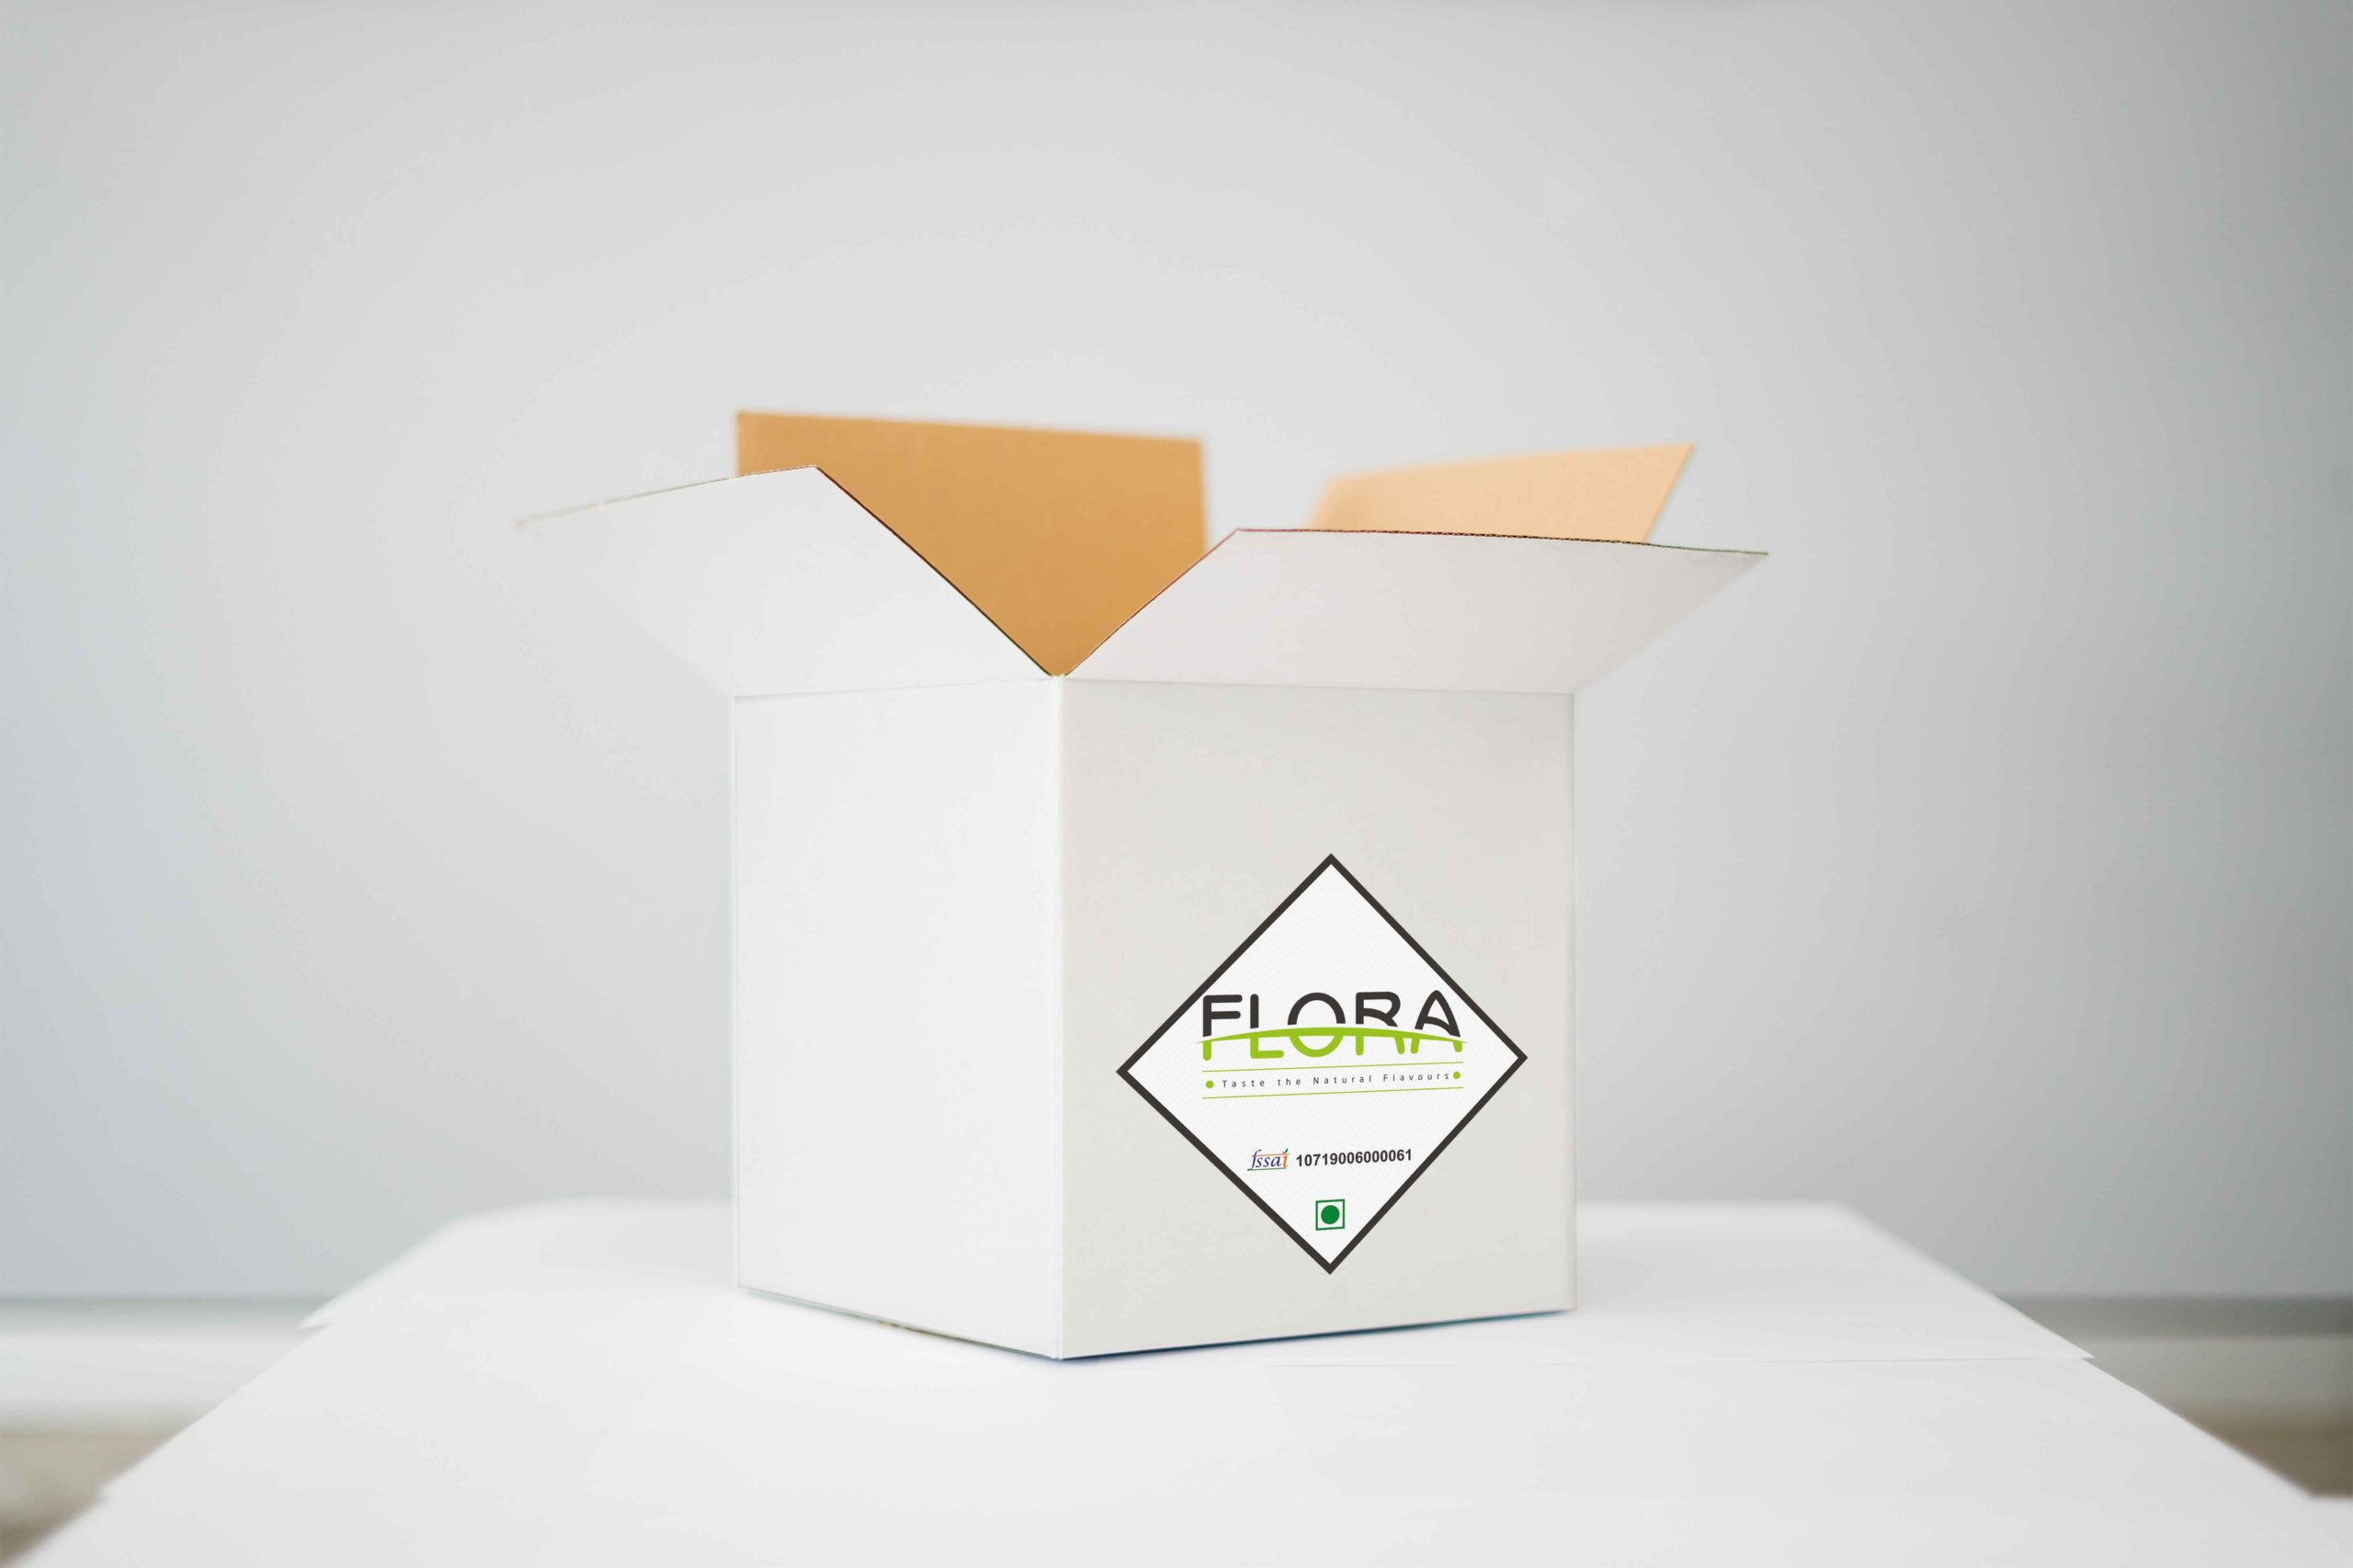 Food company flora sticker design by Badri Design